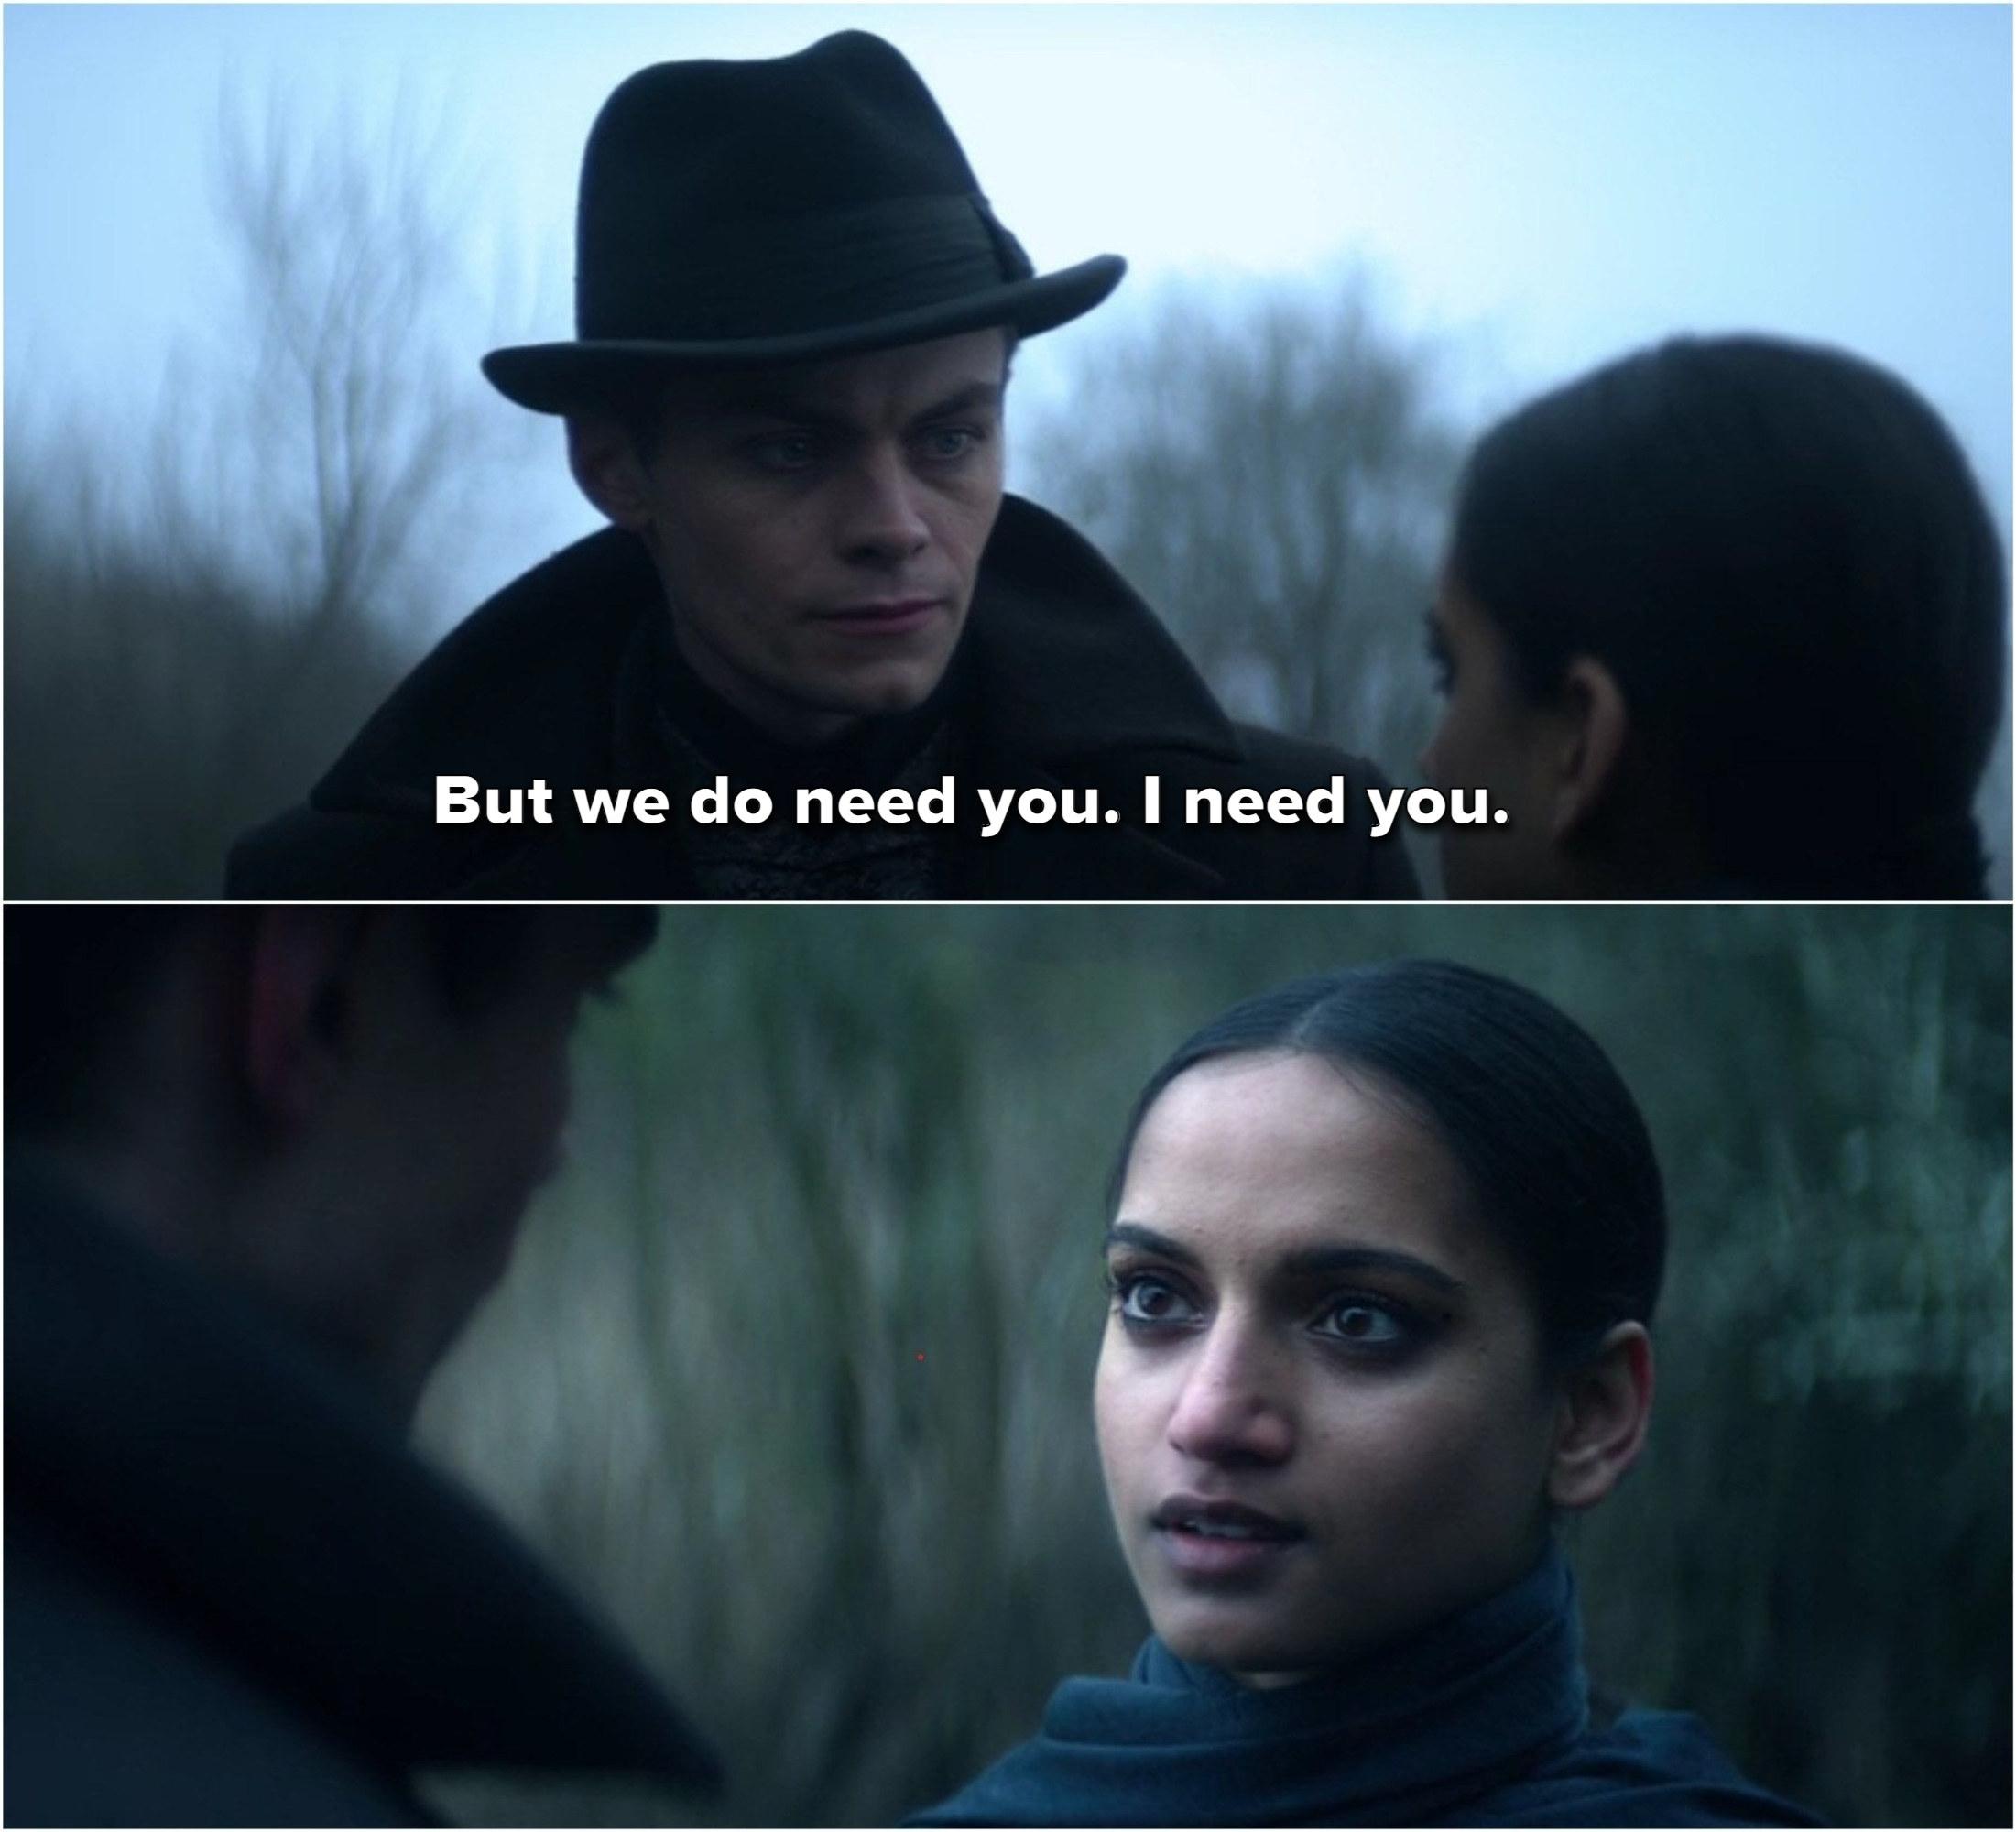 Kaz tells Inej he needs her.